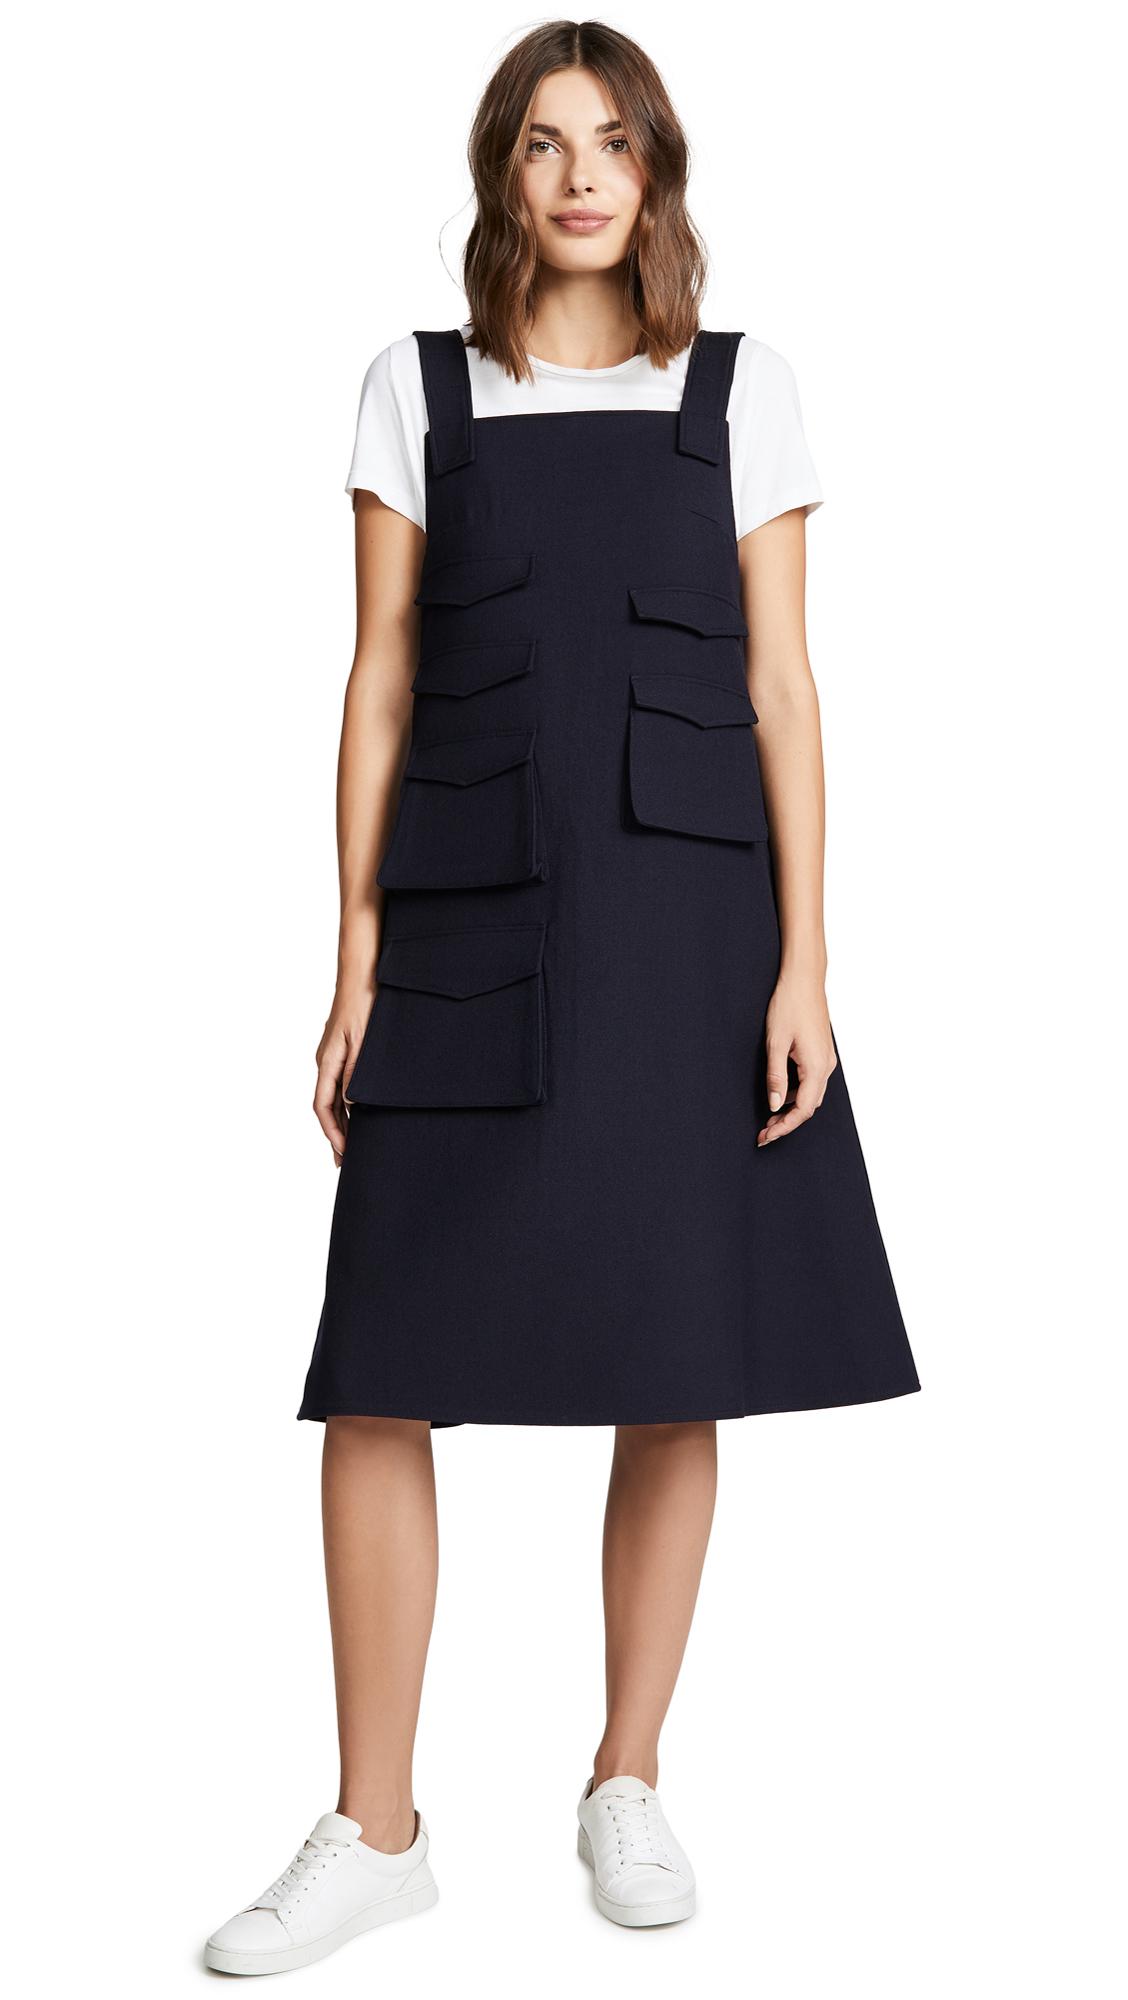 SHUSHU/TONG Pockets Dress In Navy